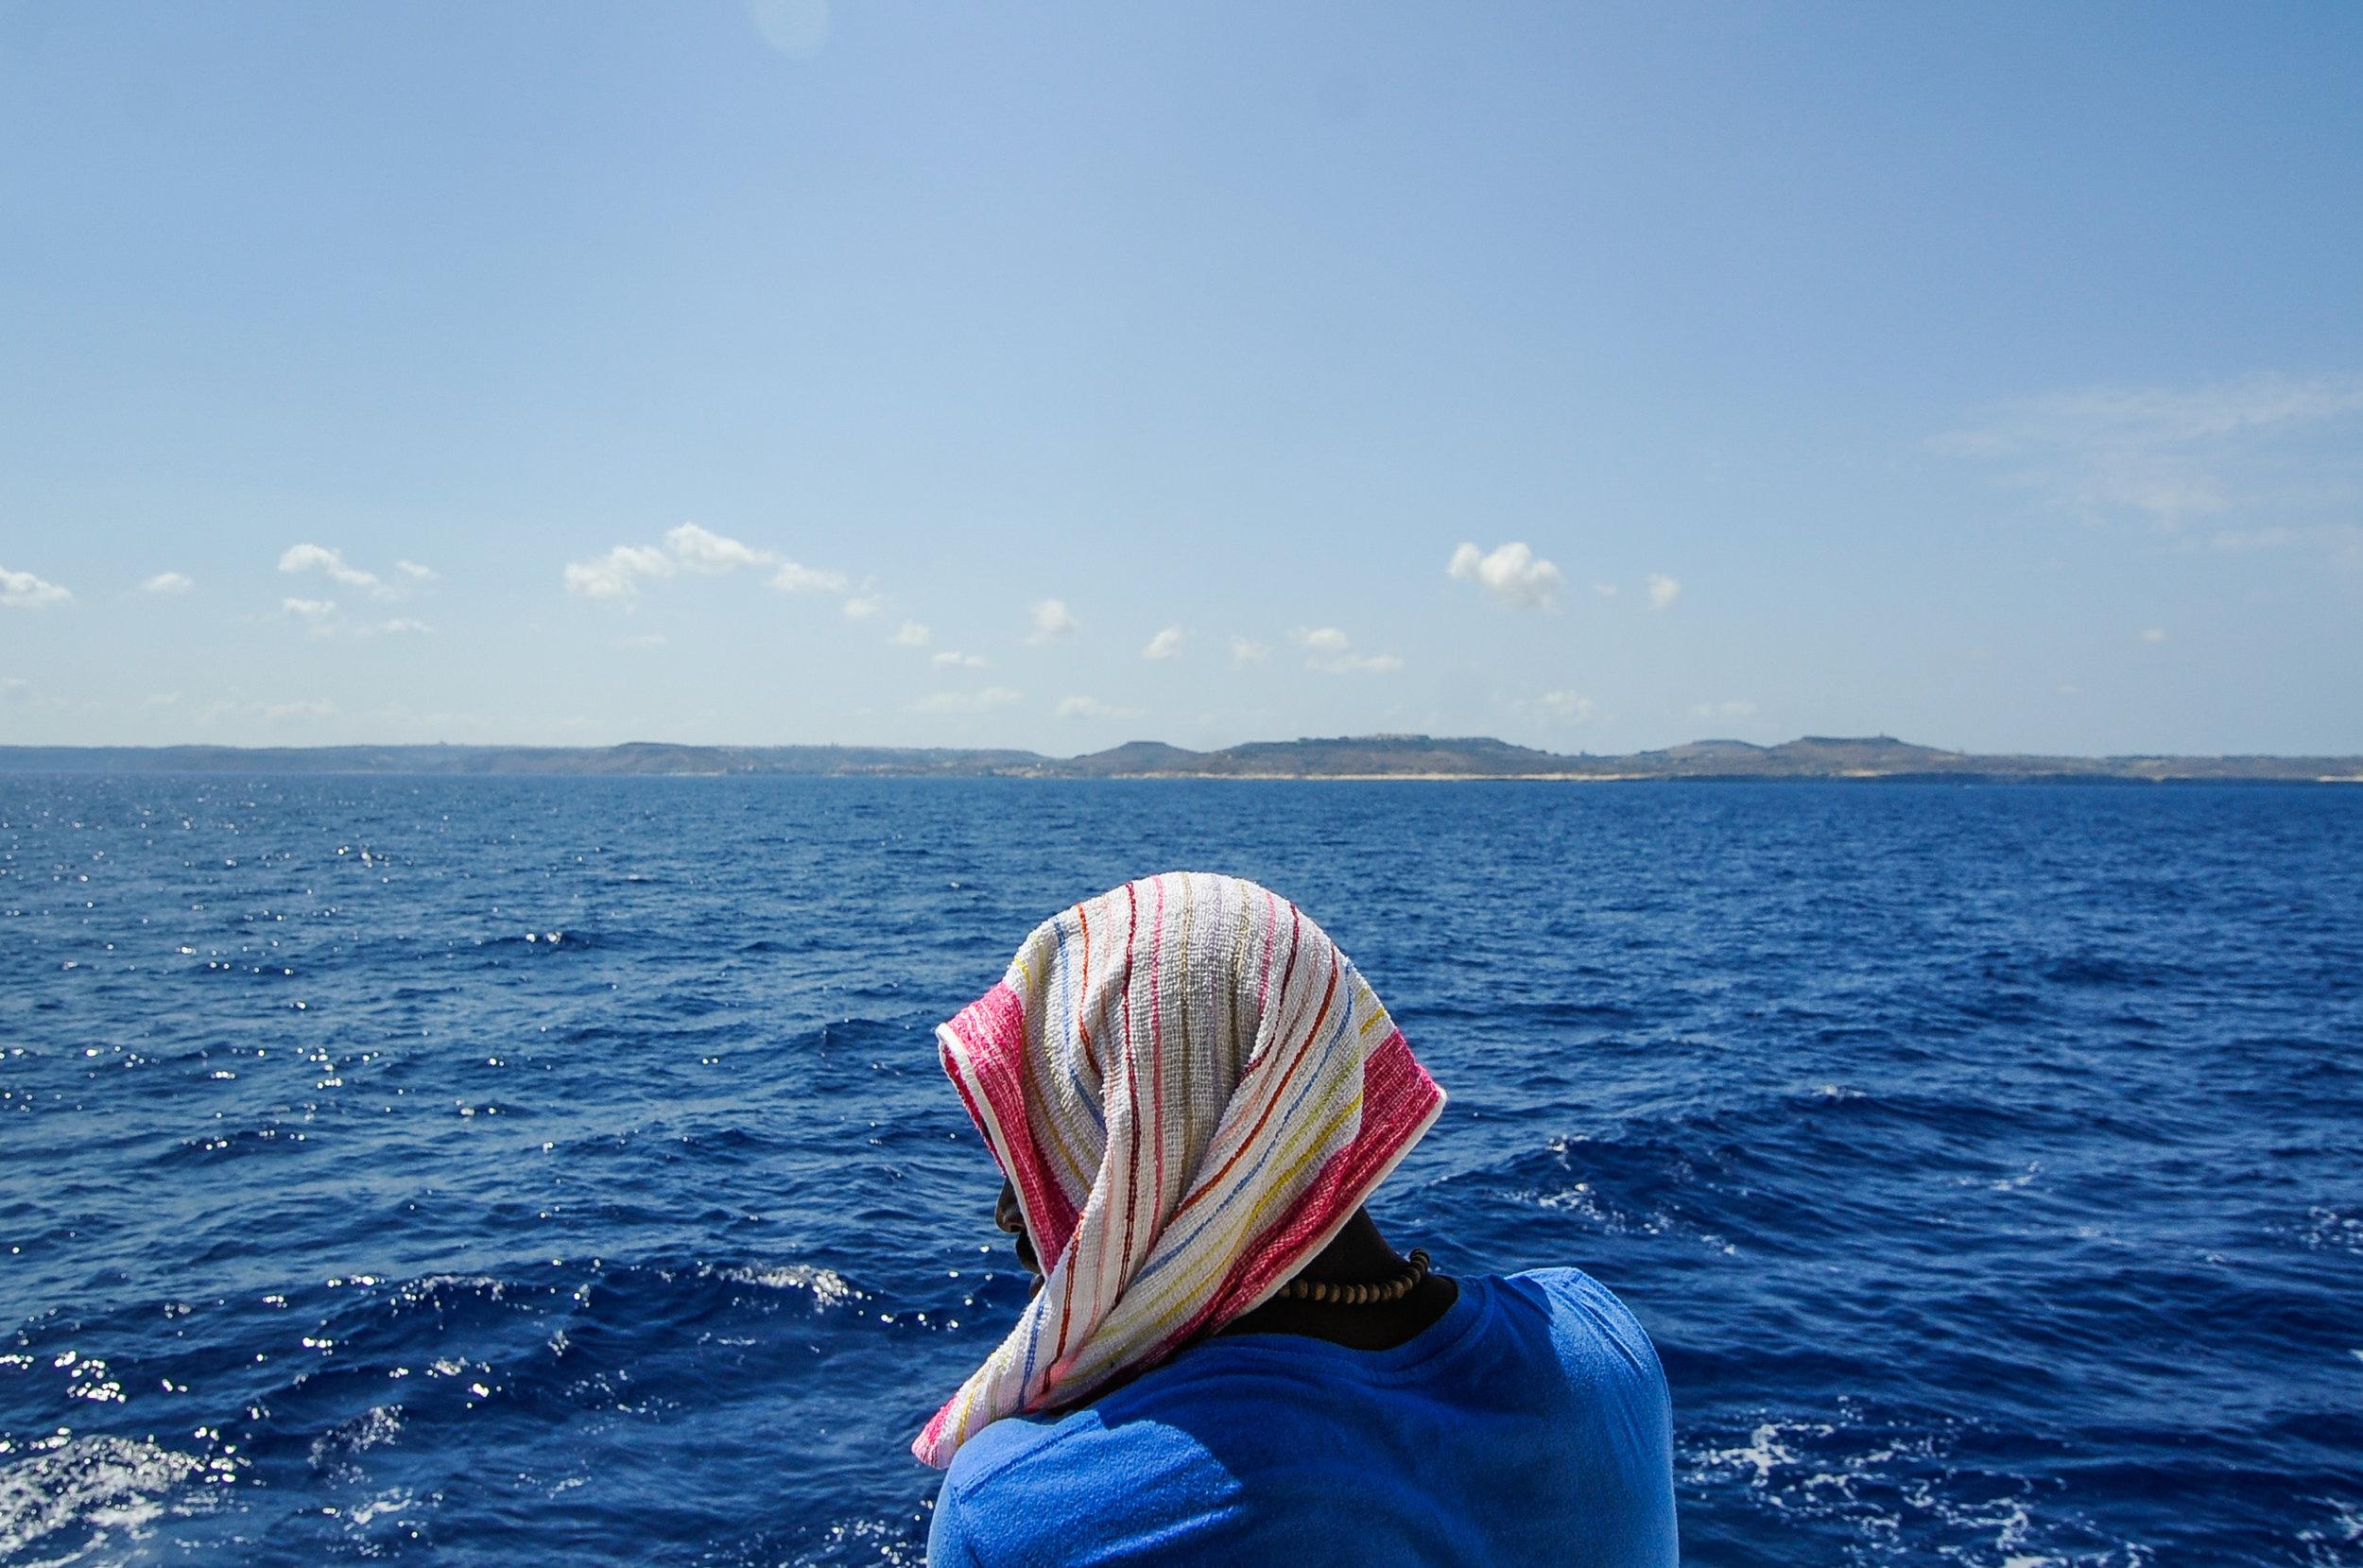 A migrant is seen on board the MV Aquarius as the rescue ship navigates toward the island of Malta, in the Mediterranean Sea, off the coast of Malta, August 15, 2018.